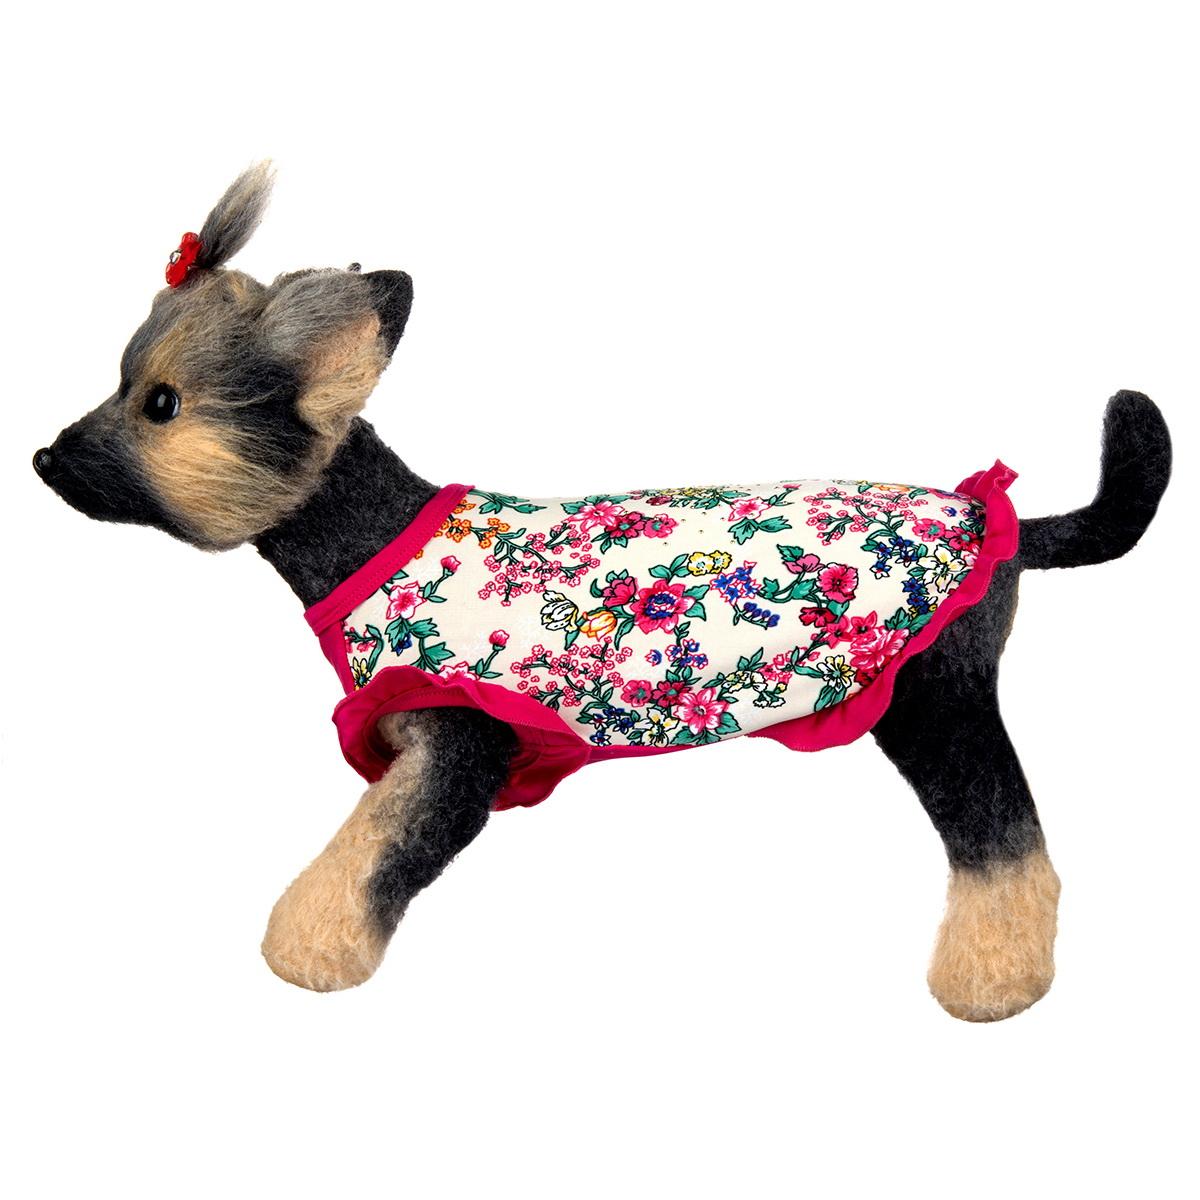 "Майка для собак Dogmoda ""Оливия"", для девочки. Размер 2 (M)"